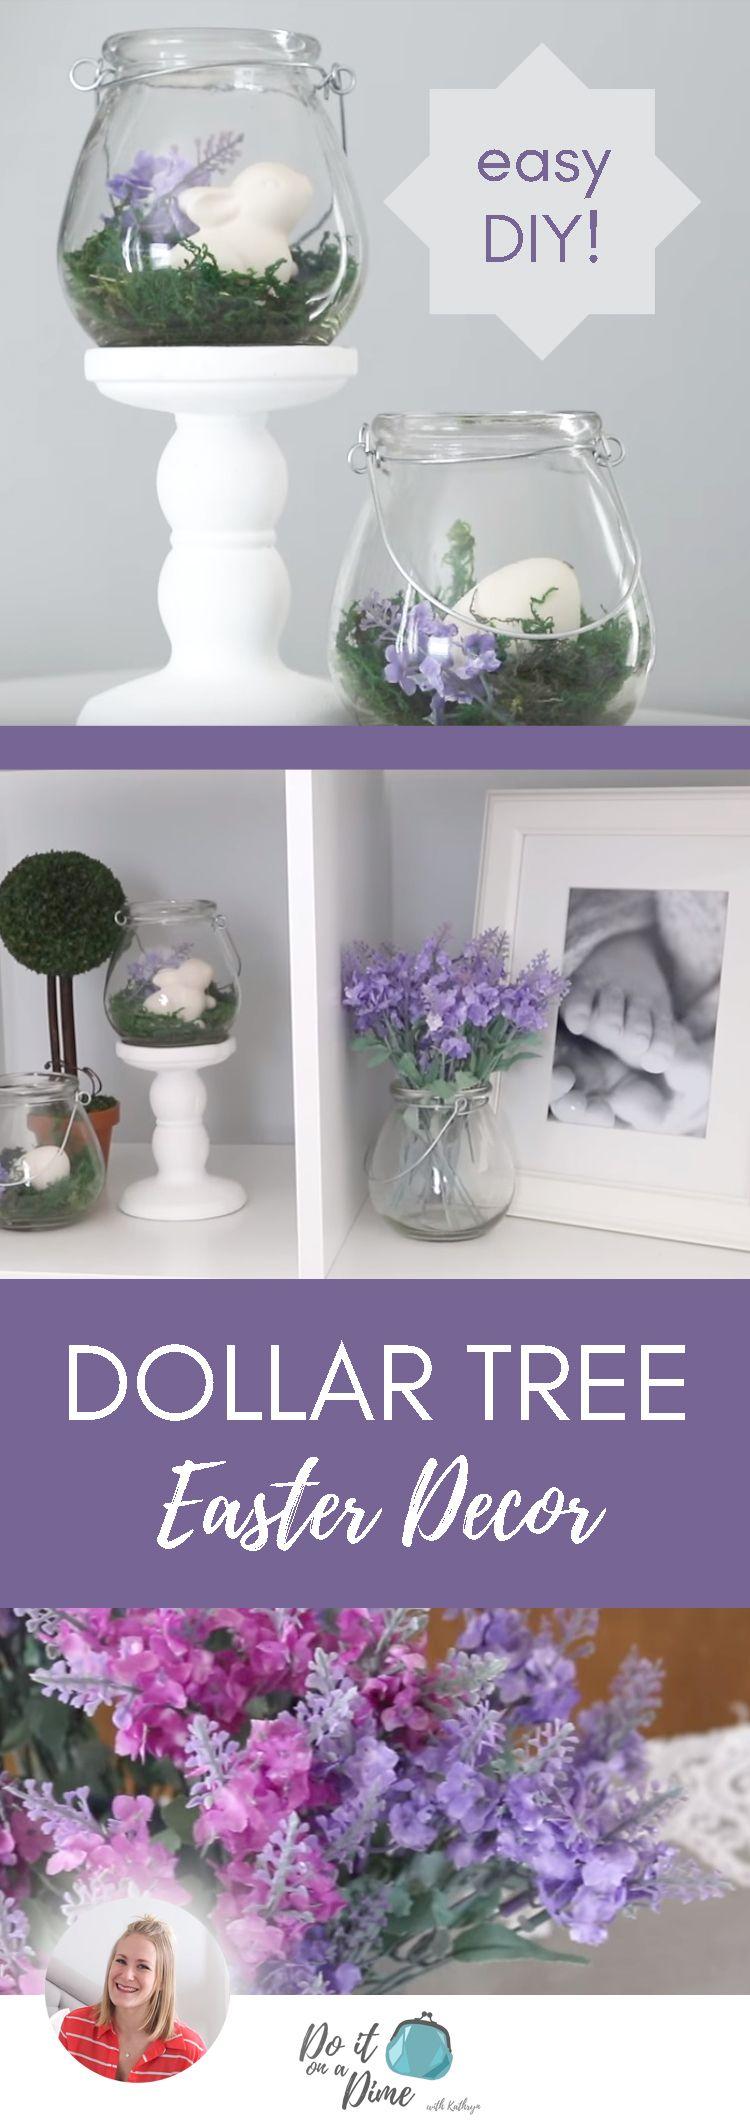 Amazing Dollar Tree Finds Easter Diy Diy Easter Decorations Dollar Tree Easter Crafts Dollar Tree Easter Decor